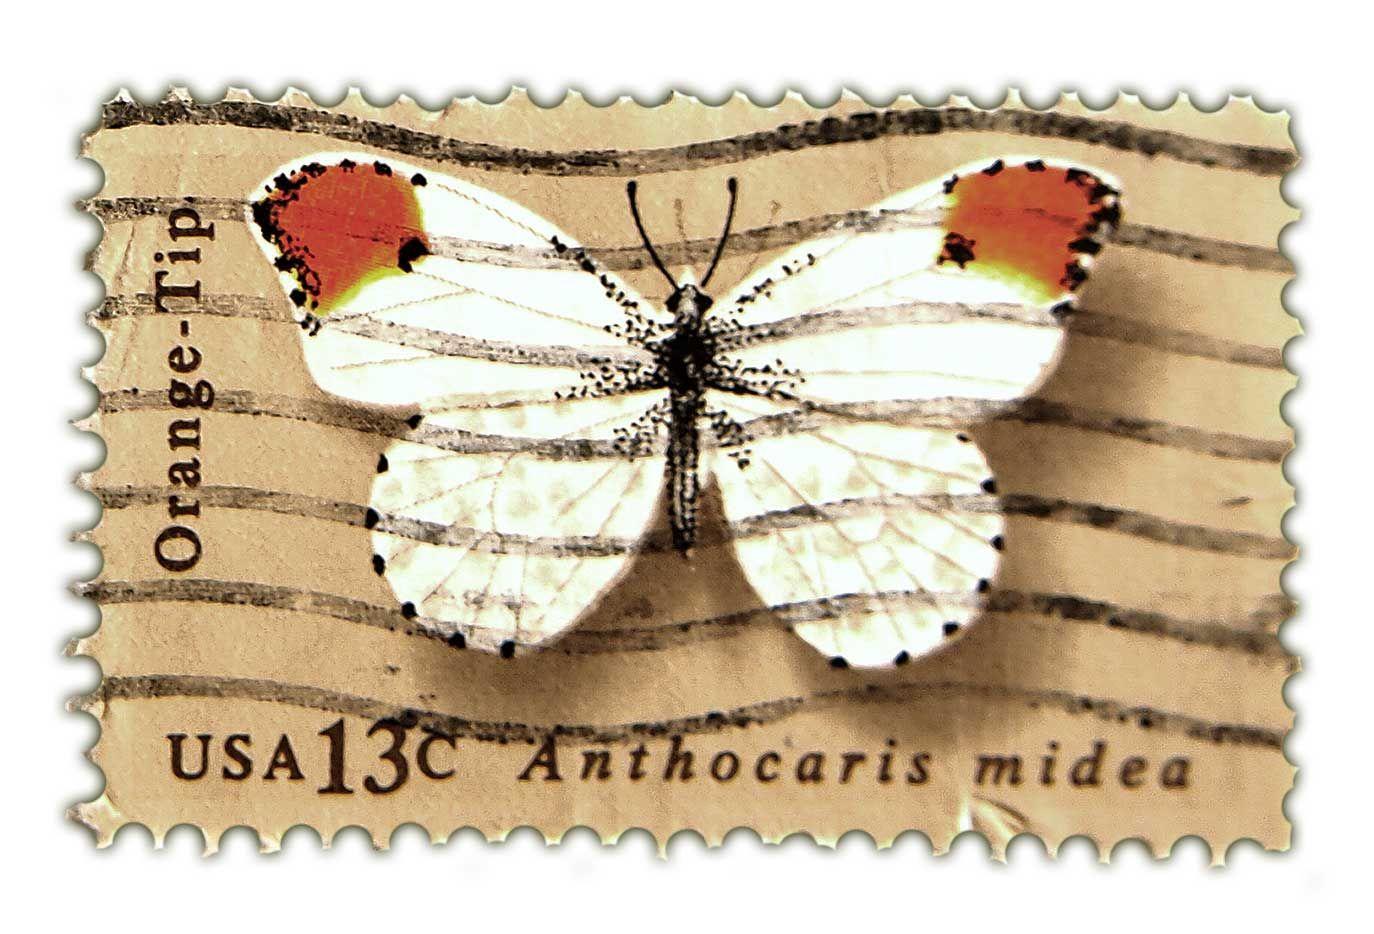 почтовые марки ретро картинки пятницу задали